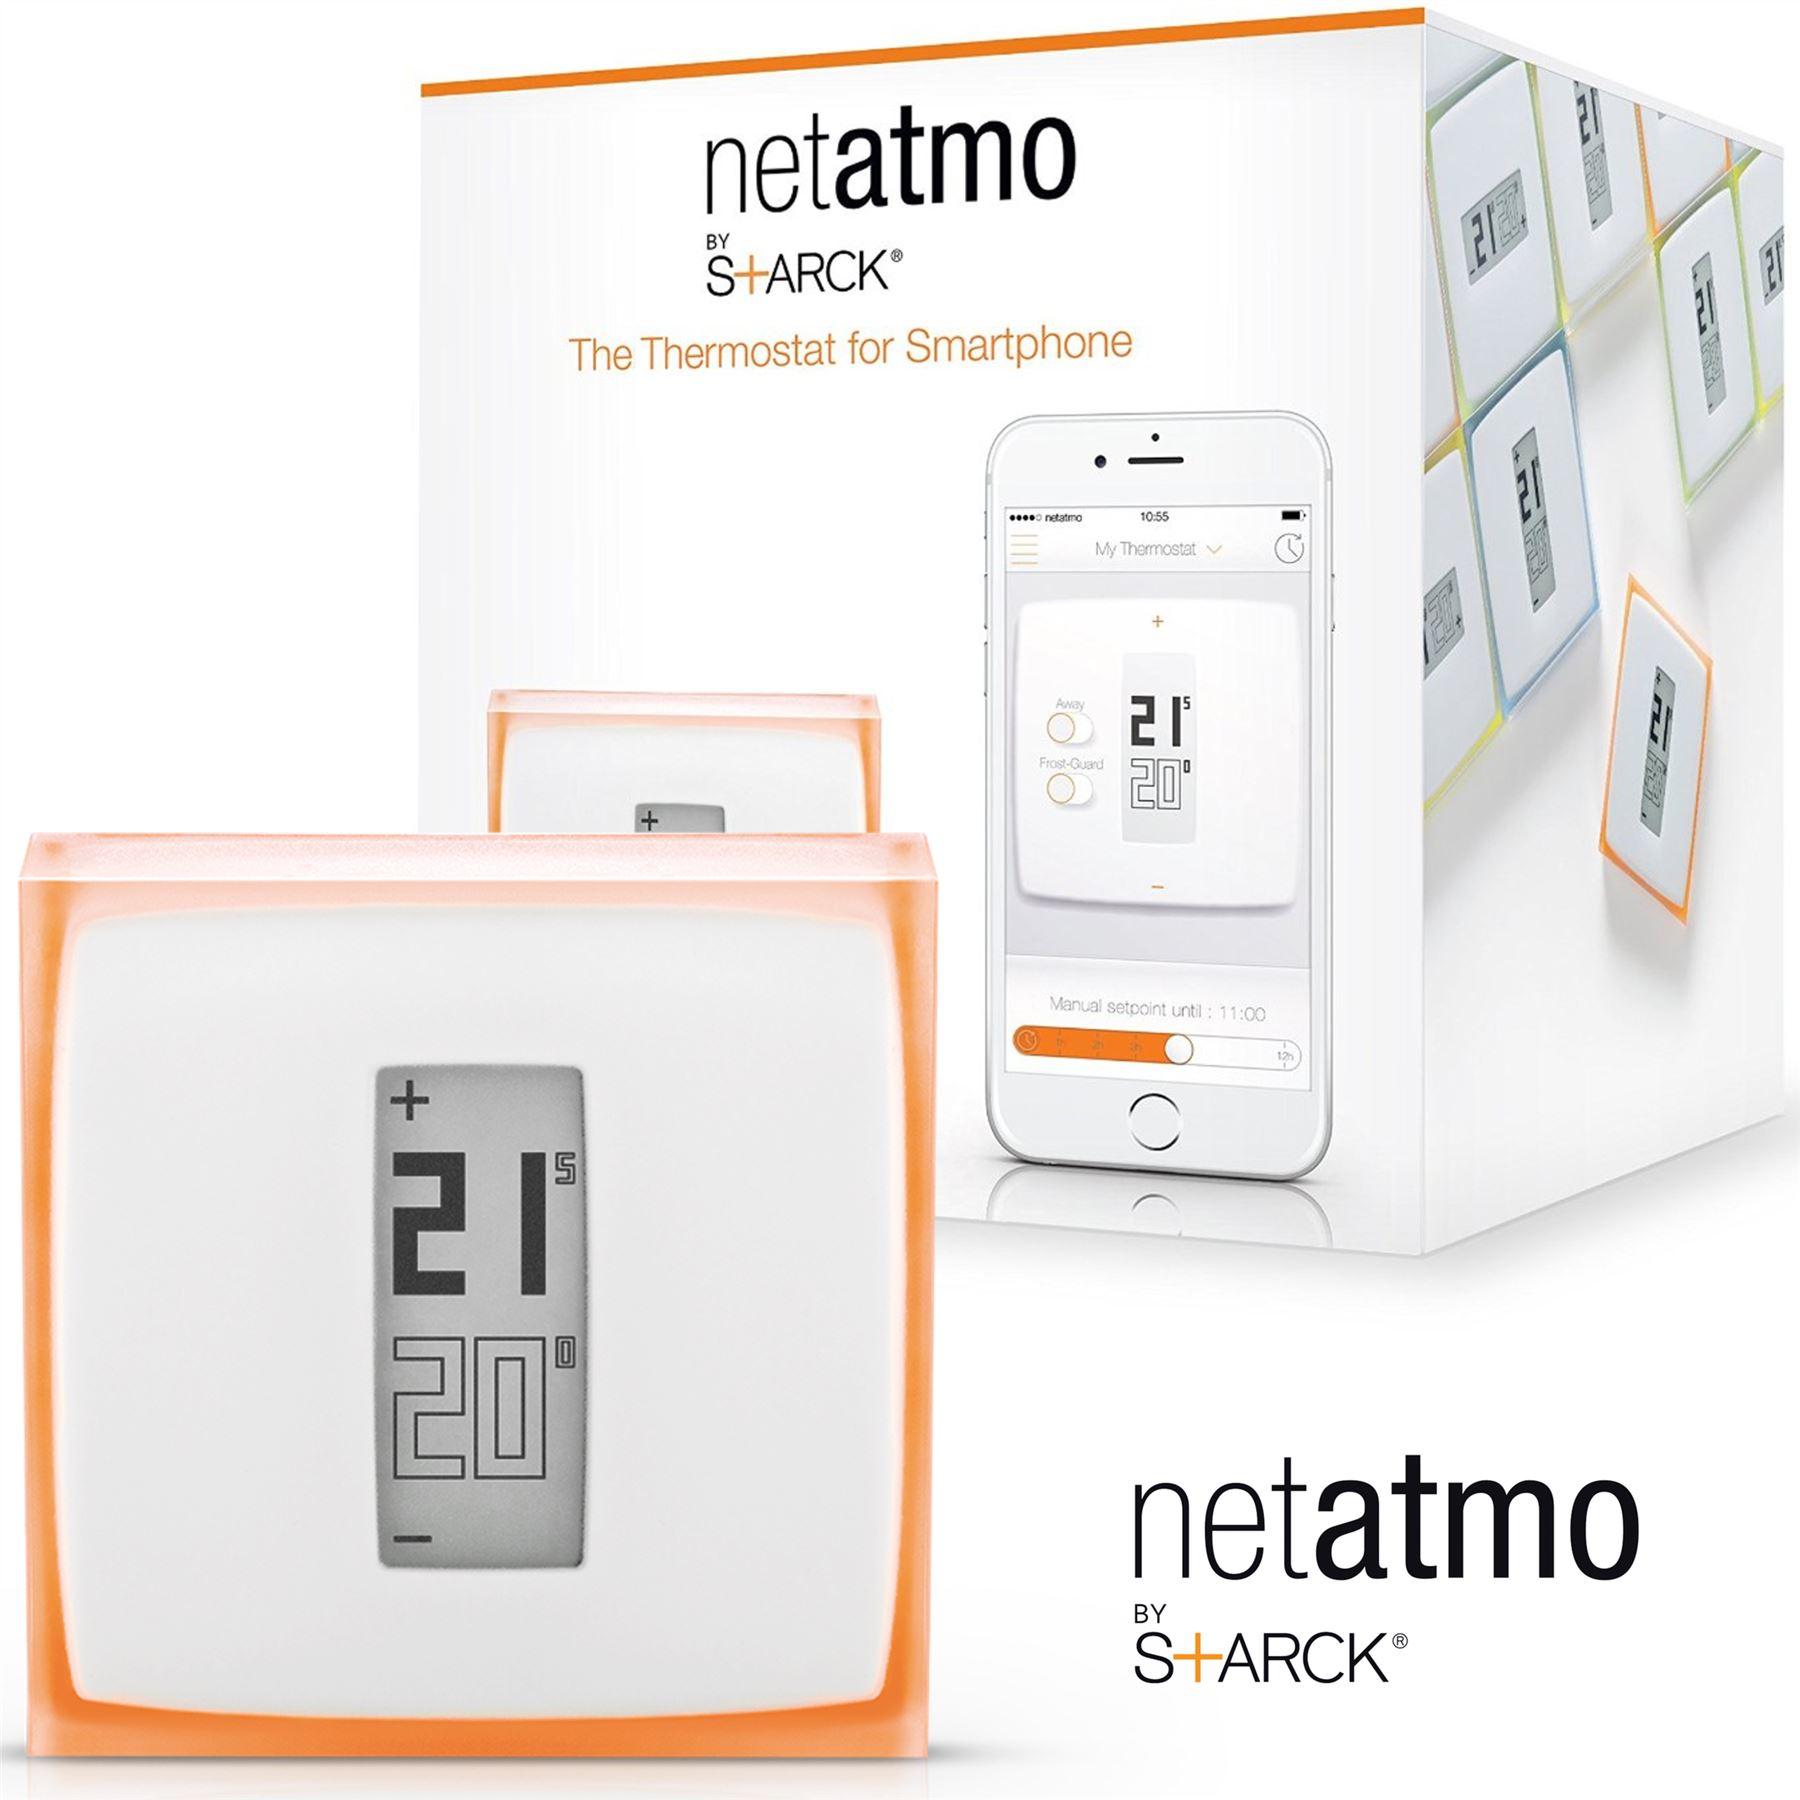 netatmo heizung thermostat f r smartphone mobile kontrolle. Black Bedroom Furniture Sets. Home Design Ideas